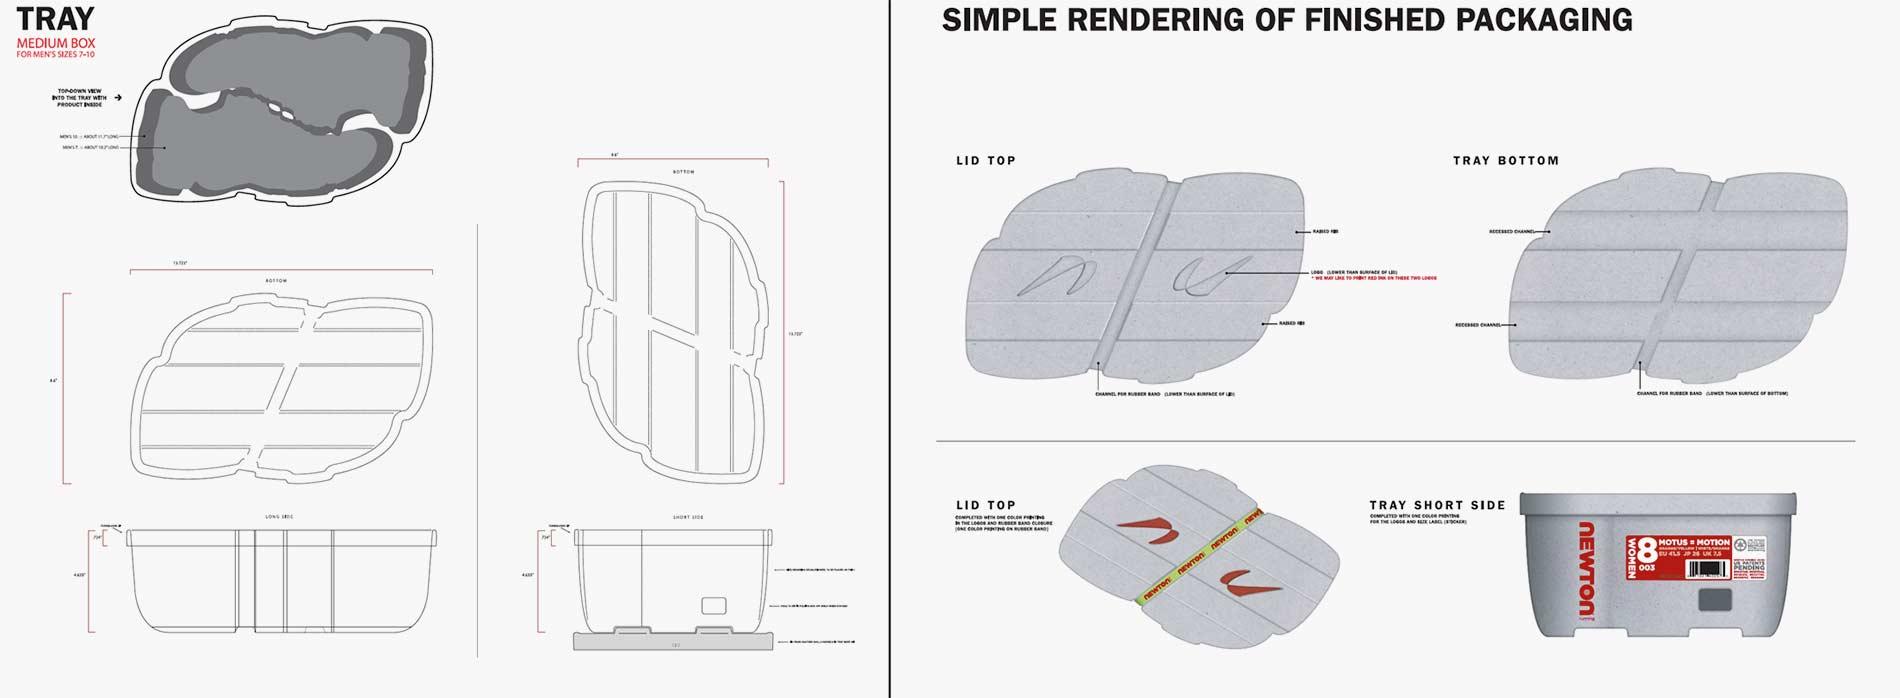 Newton-Running-Shoe_Packaging-Design_Molded-Paper-Pulp_Shoe-Box_Overview.jpg